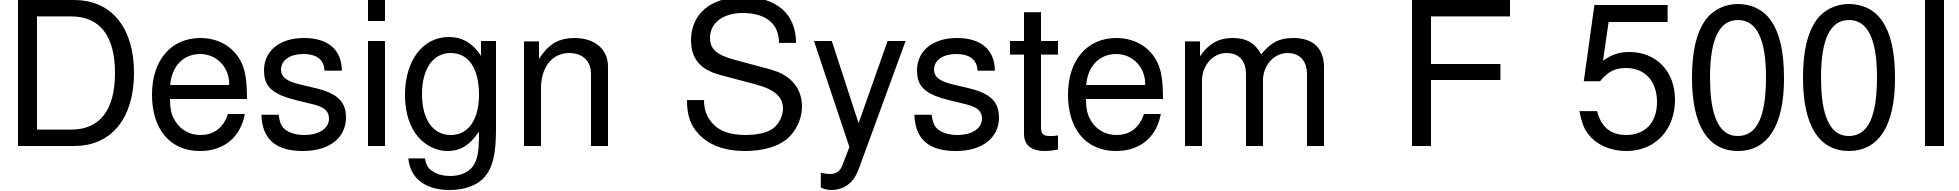 Design System F 500I